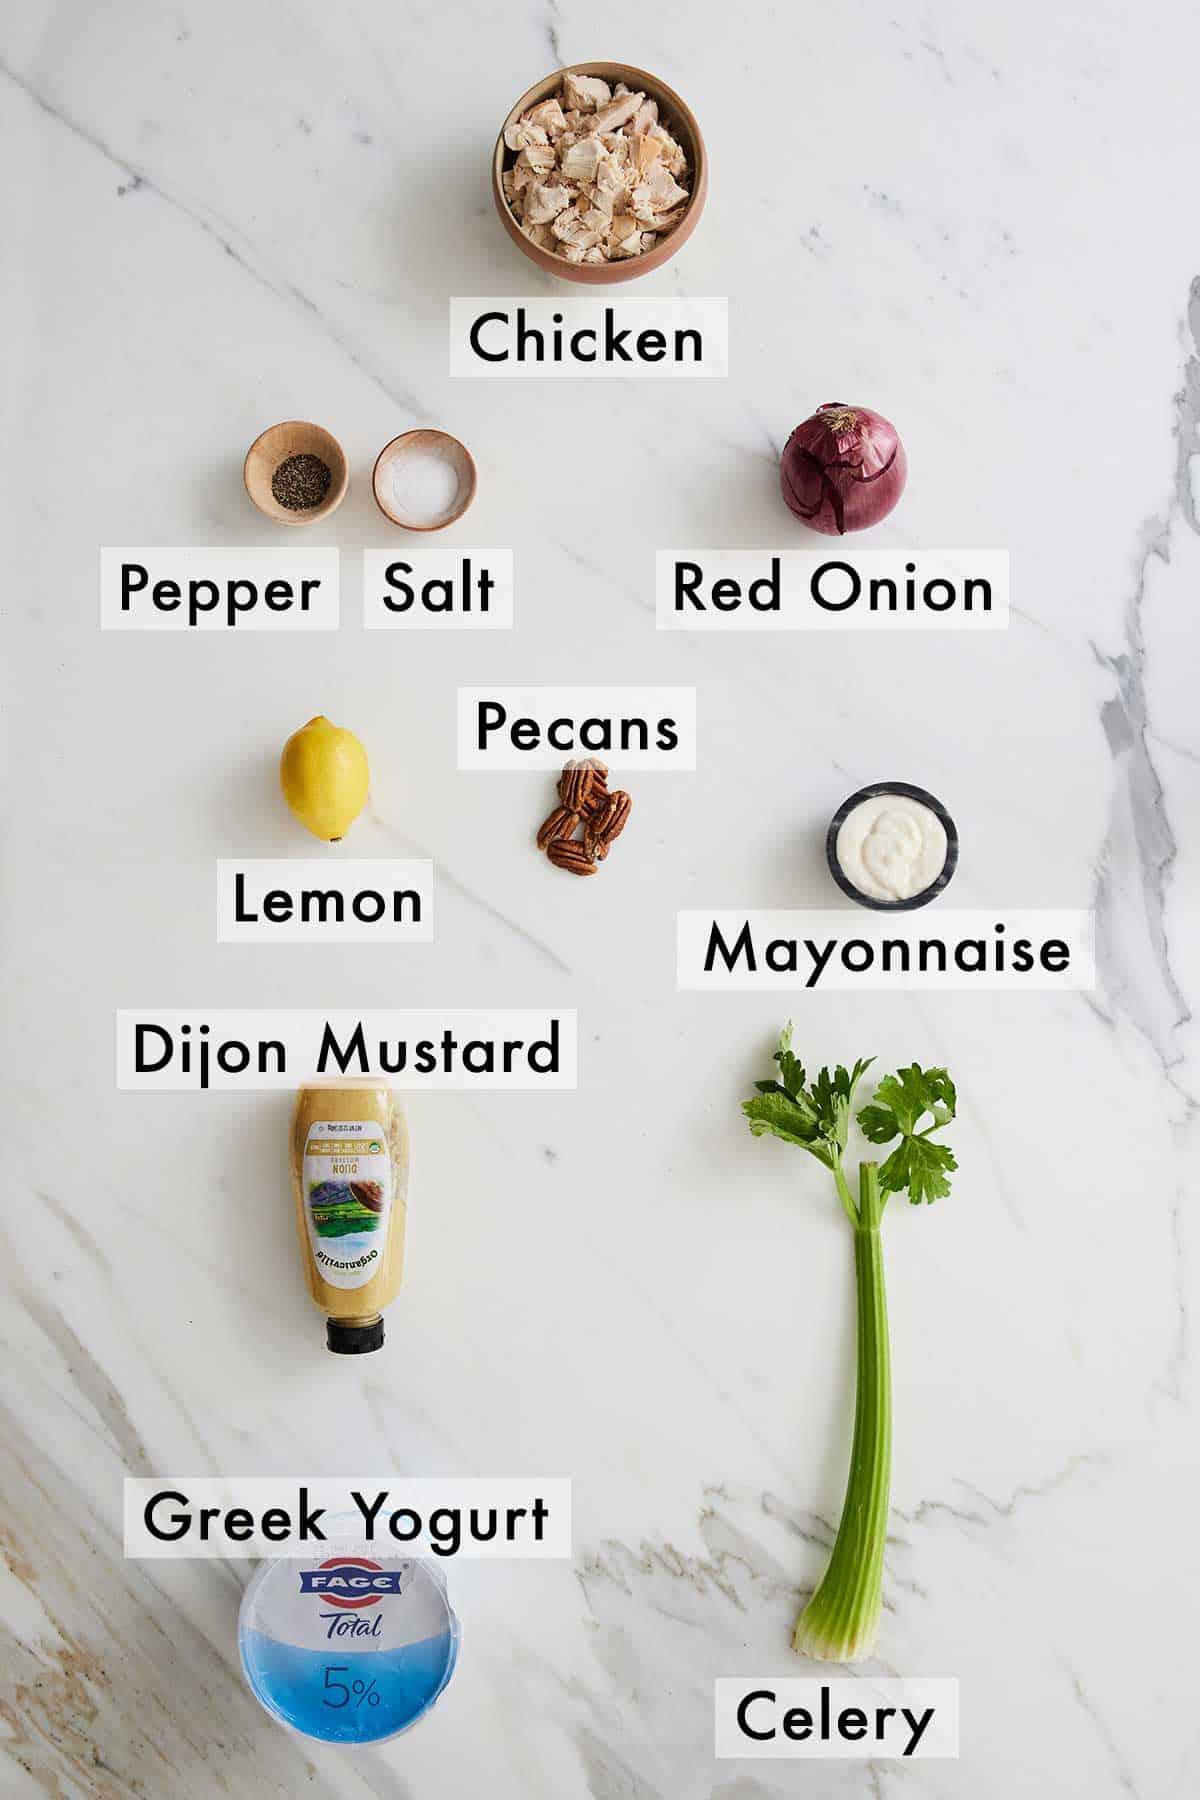 Ingredients needed to make chicken salad.